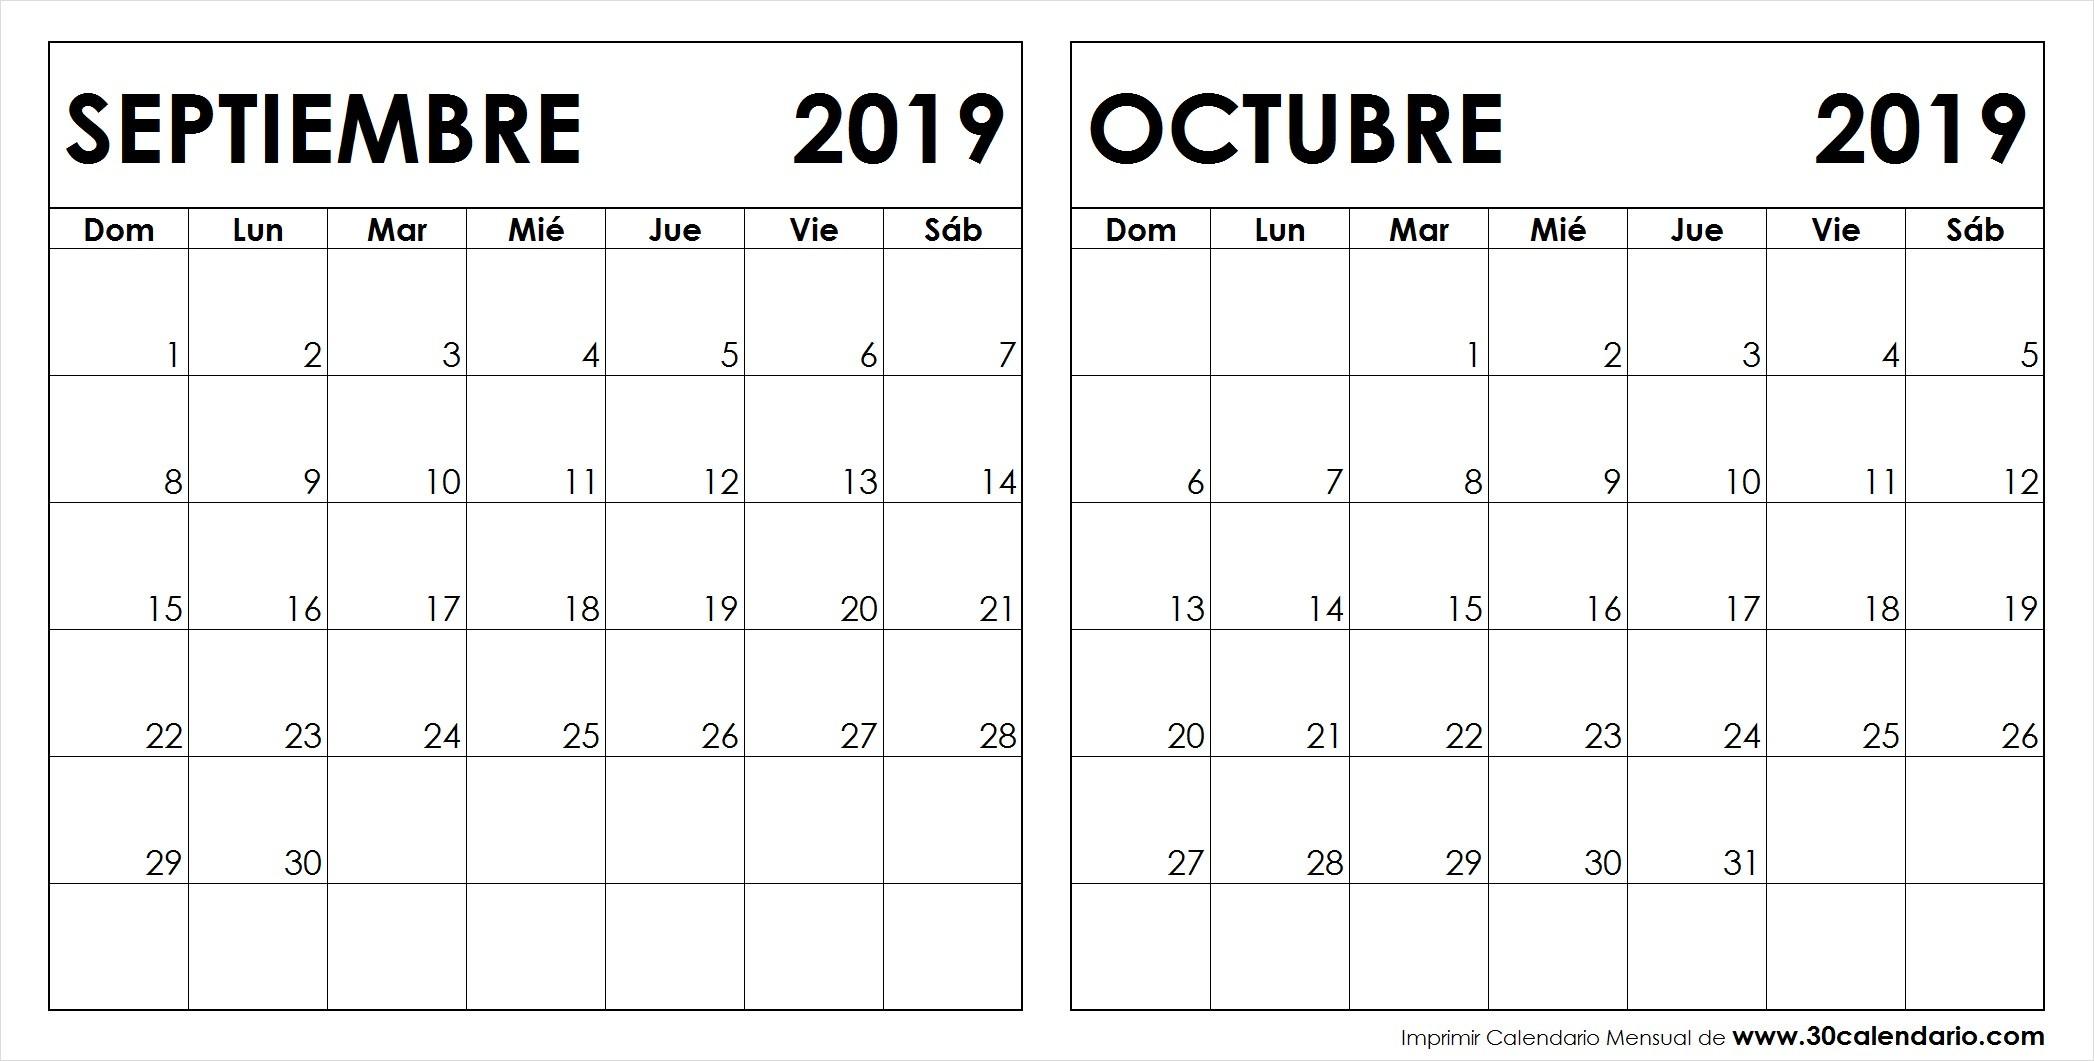 Calendario Septiembre Octubre 2019 Para Imprimir